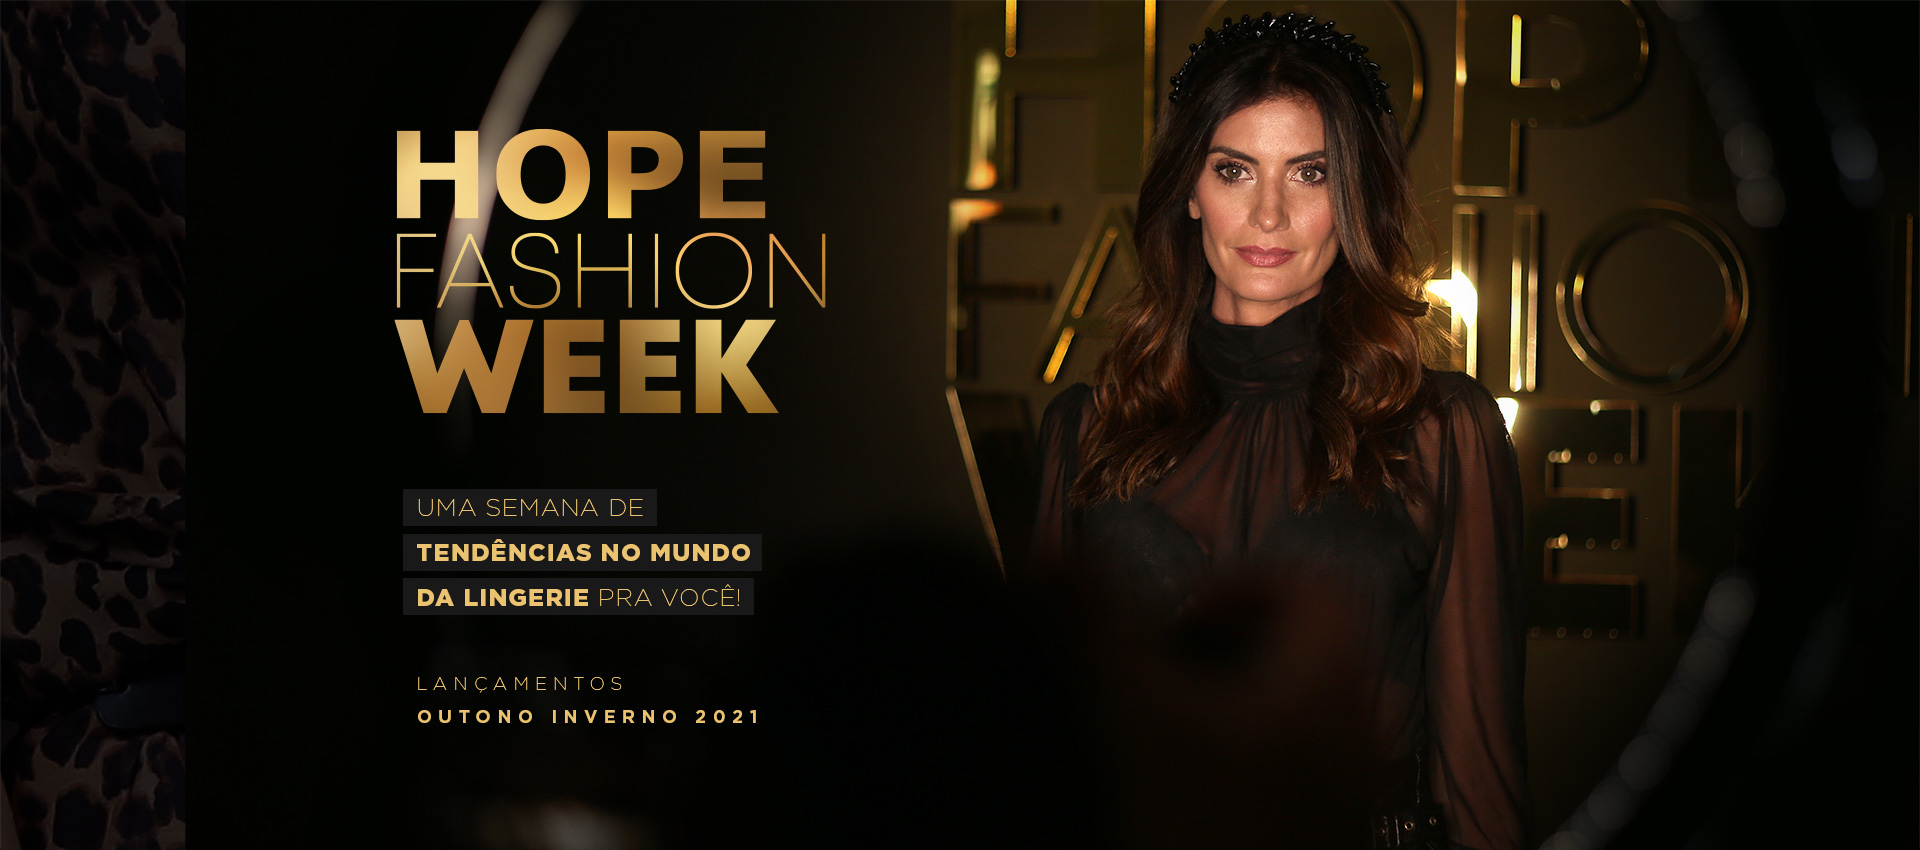 HOPE Fashion Week - Live Experience